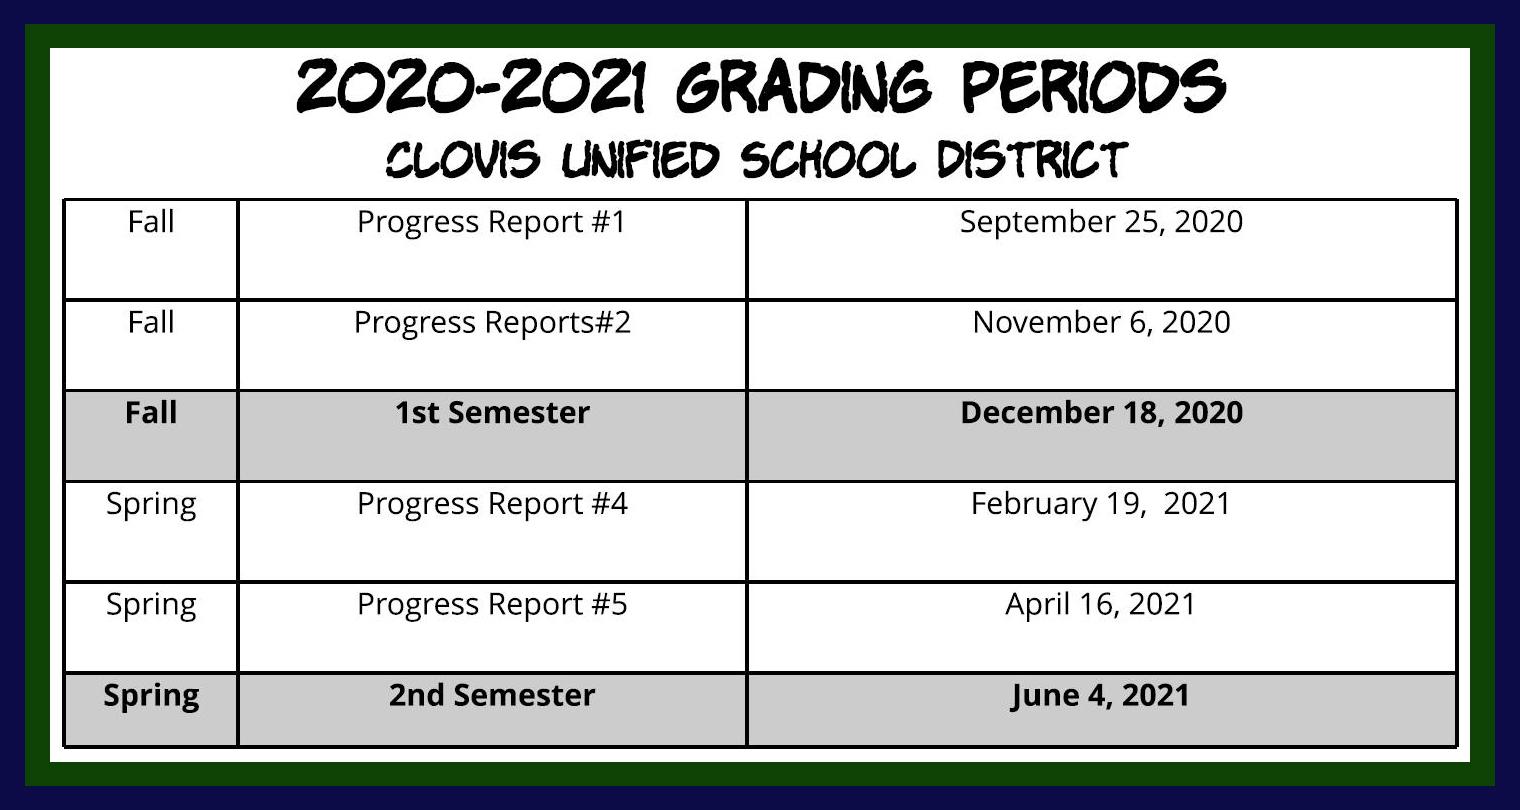 2020-2021 Grading Periods CUSD Information sheet